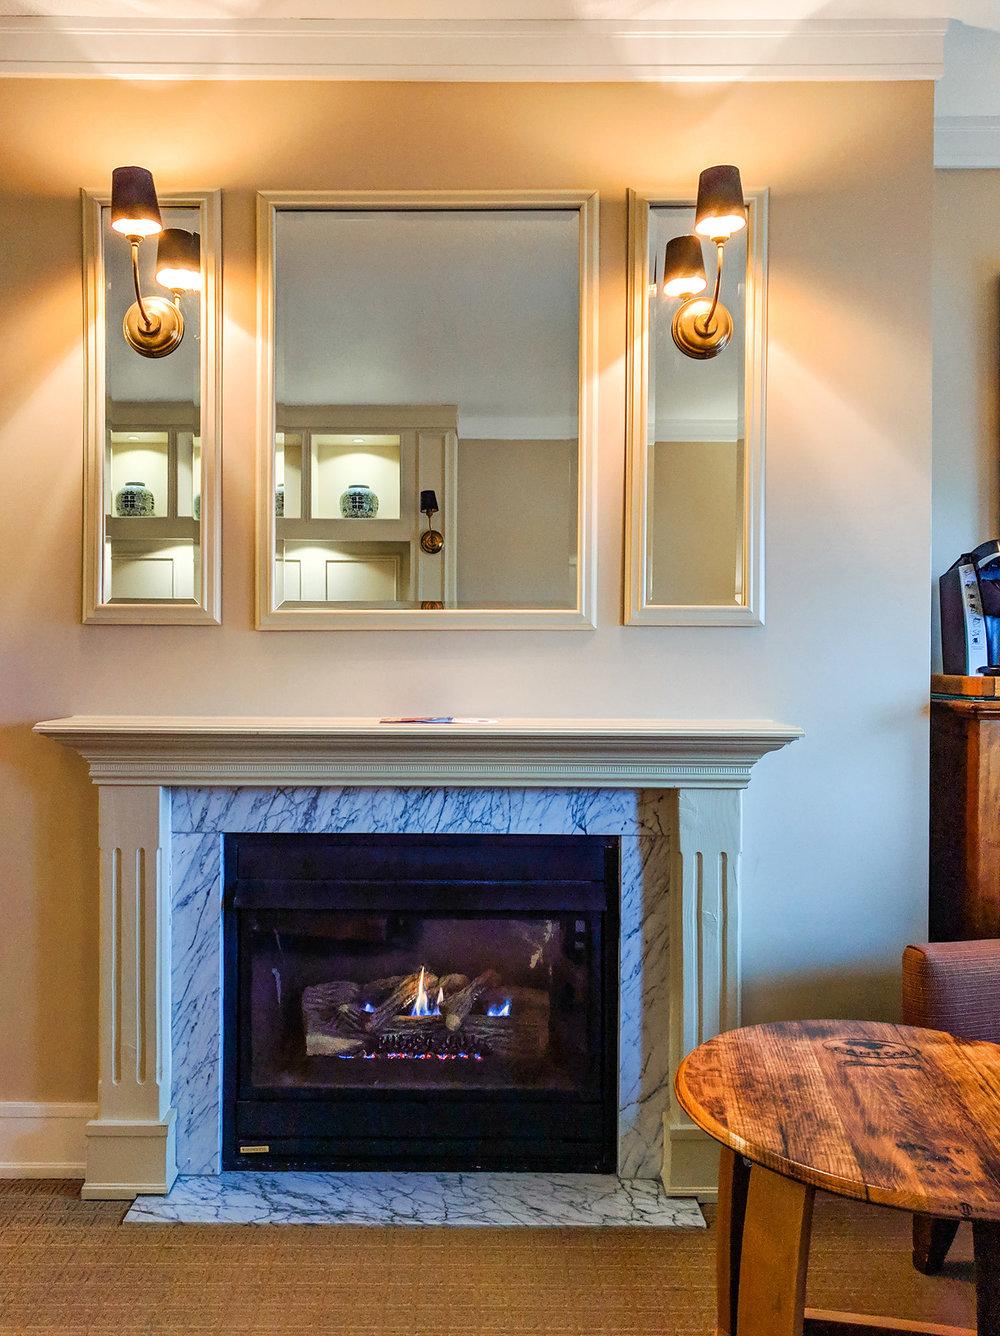 Napa River Inn fireplace